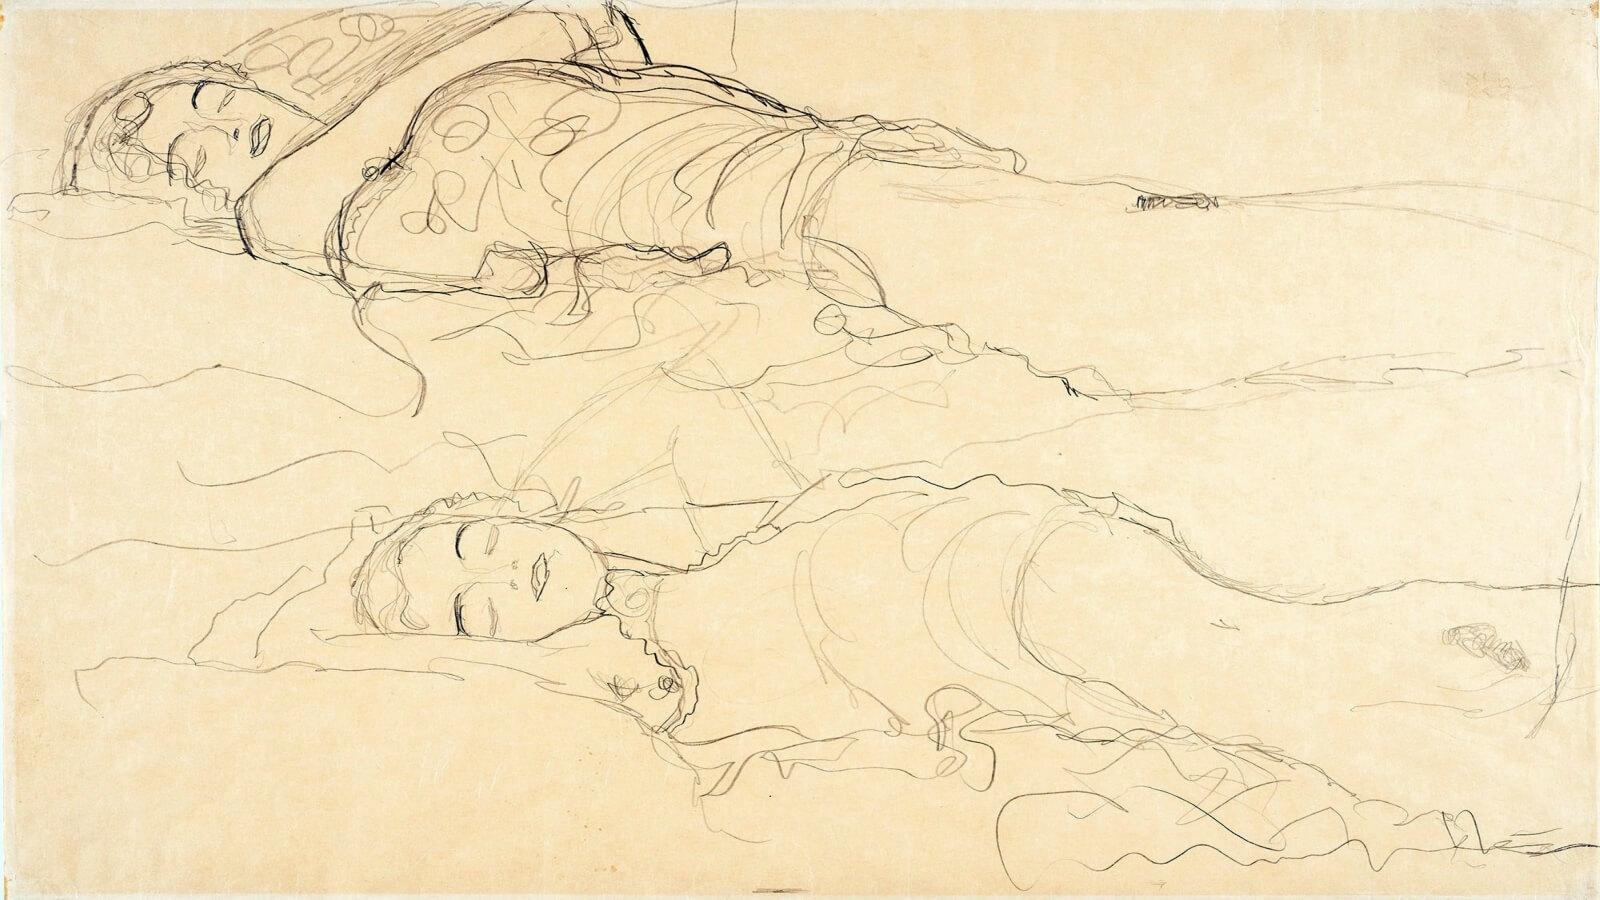 Encuentran dibujo perdido de Klimt